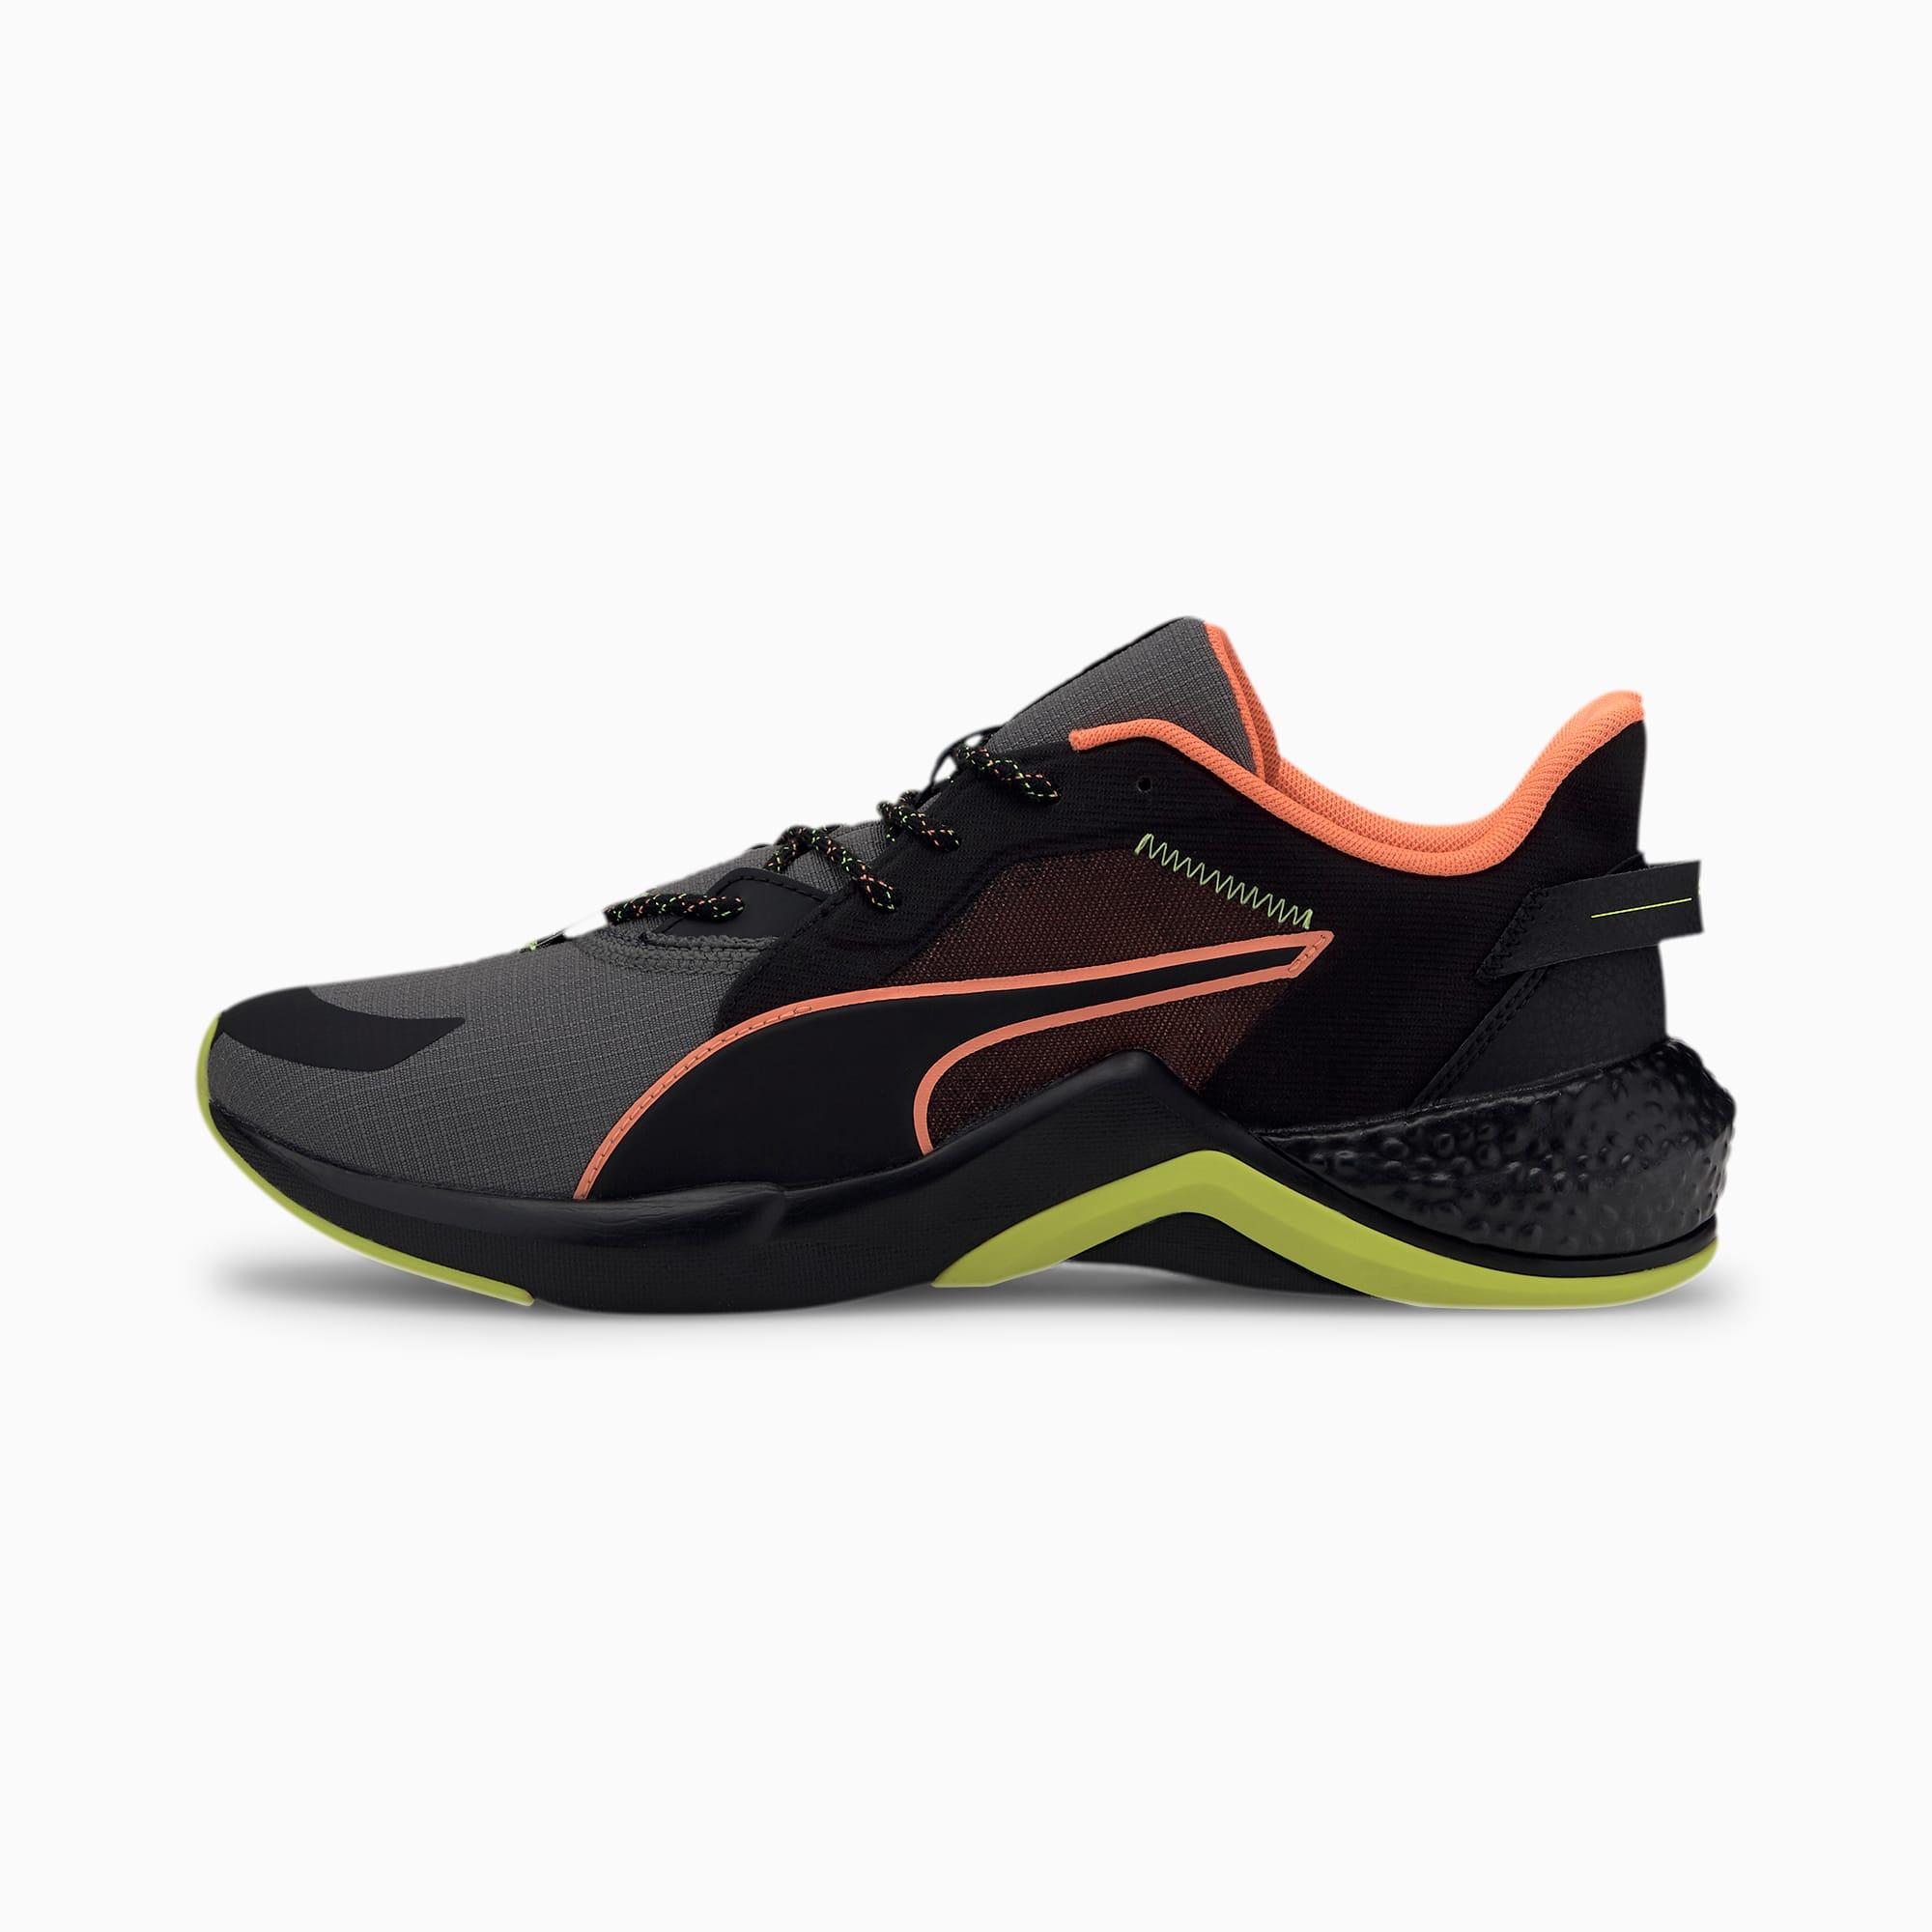 PUMA x FIRST MILE HYBRID NX Ozone Men's Running Shoes